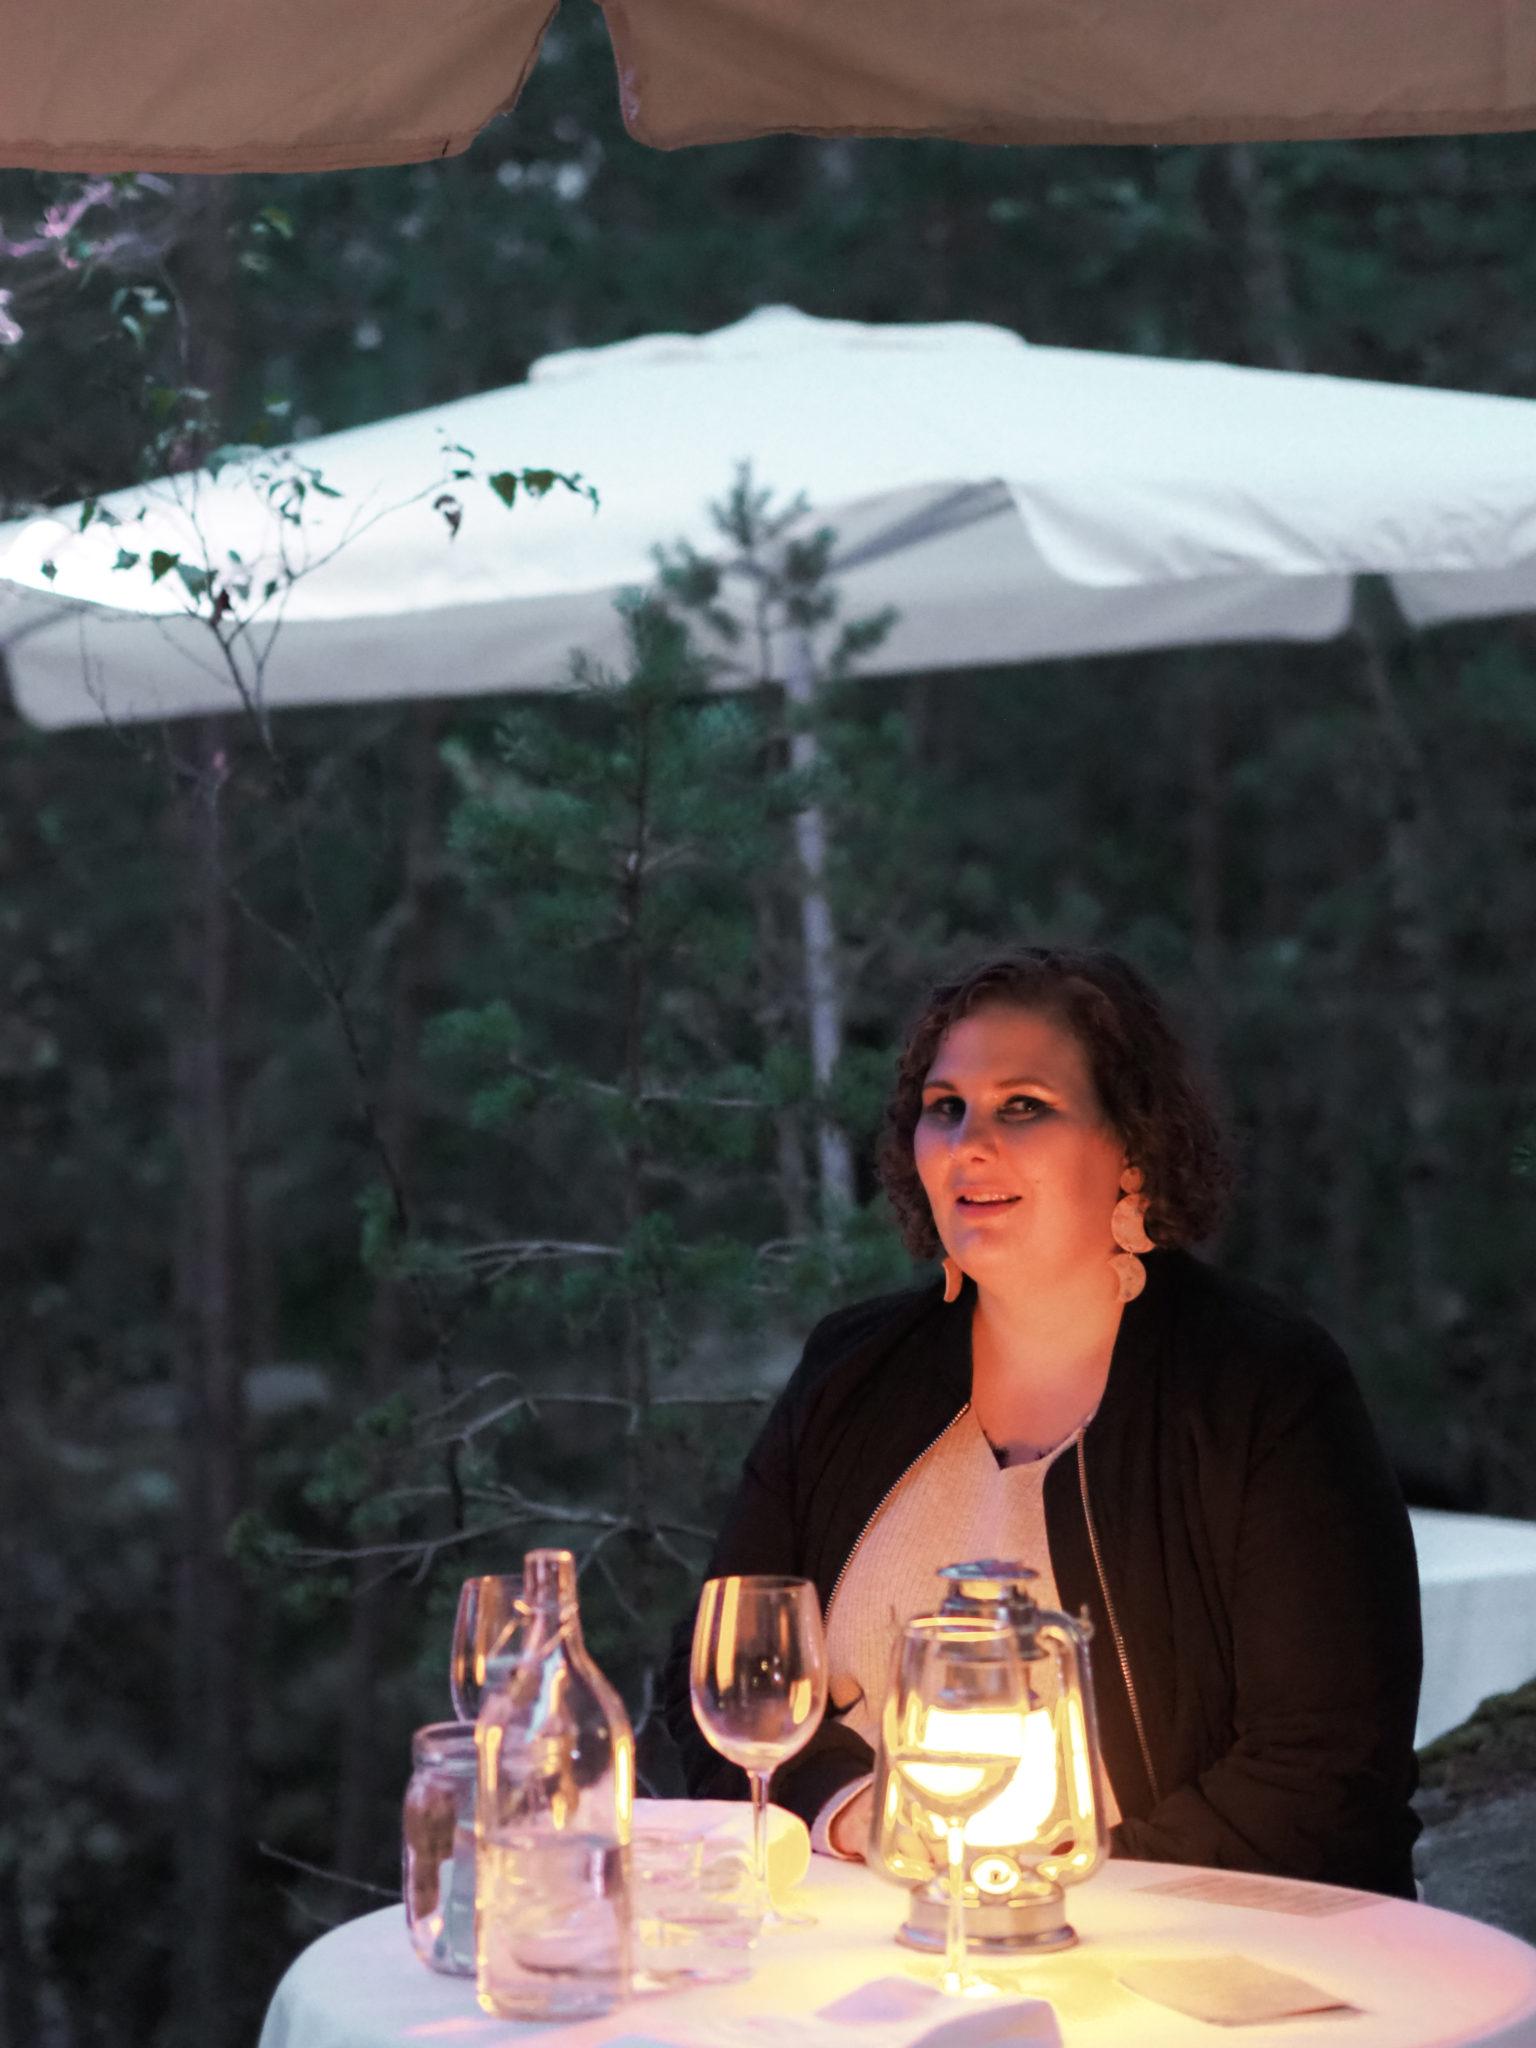 Viikon parhaat - Metsäravintola Nielu - BMH - Big mamas home by Jenni